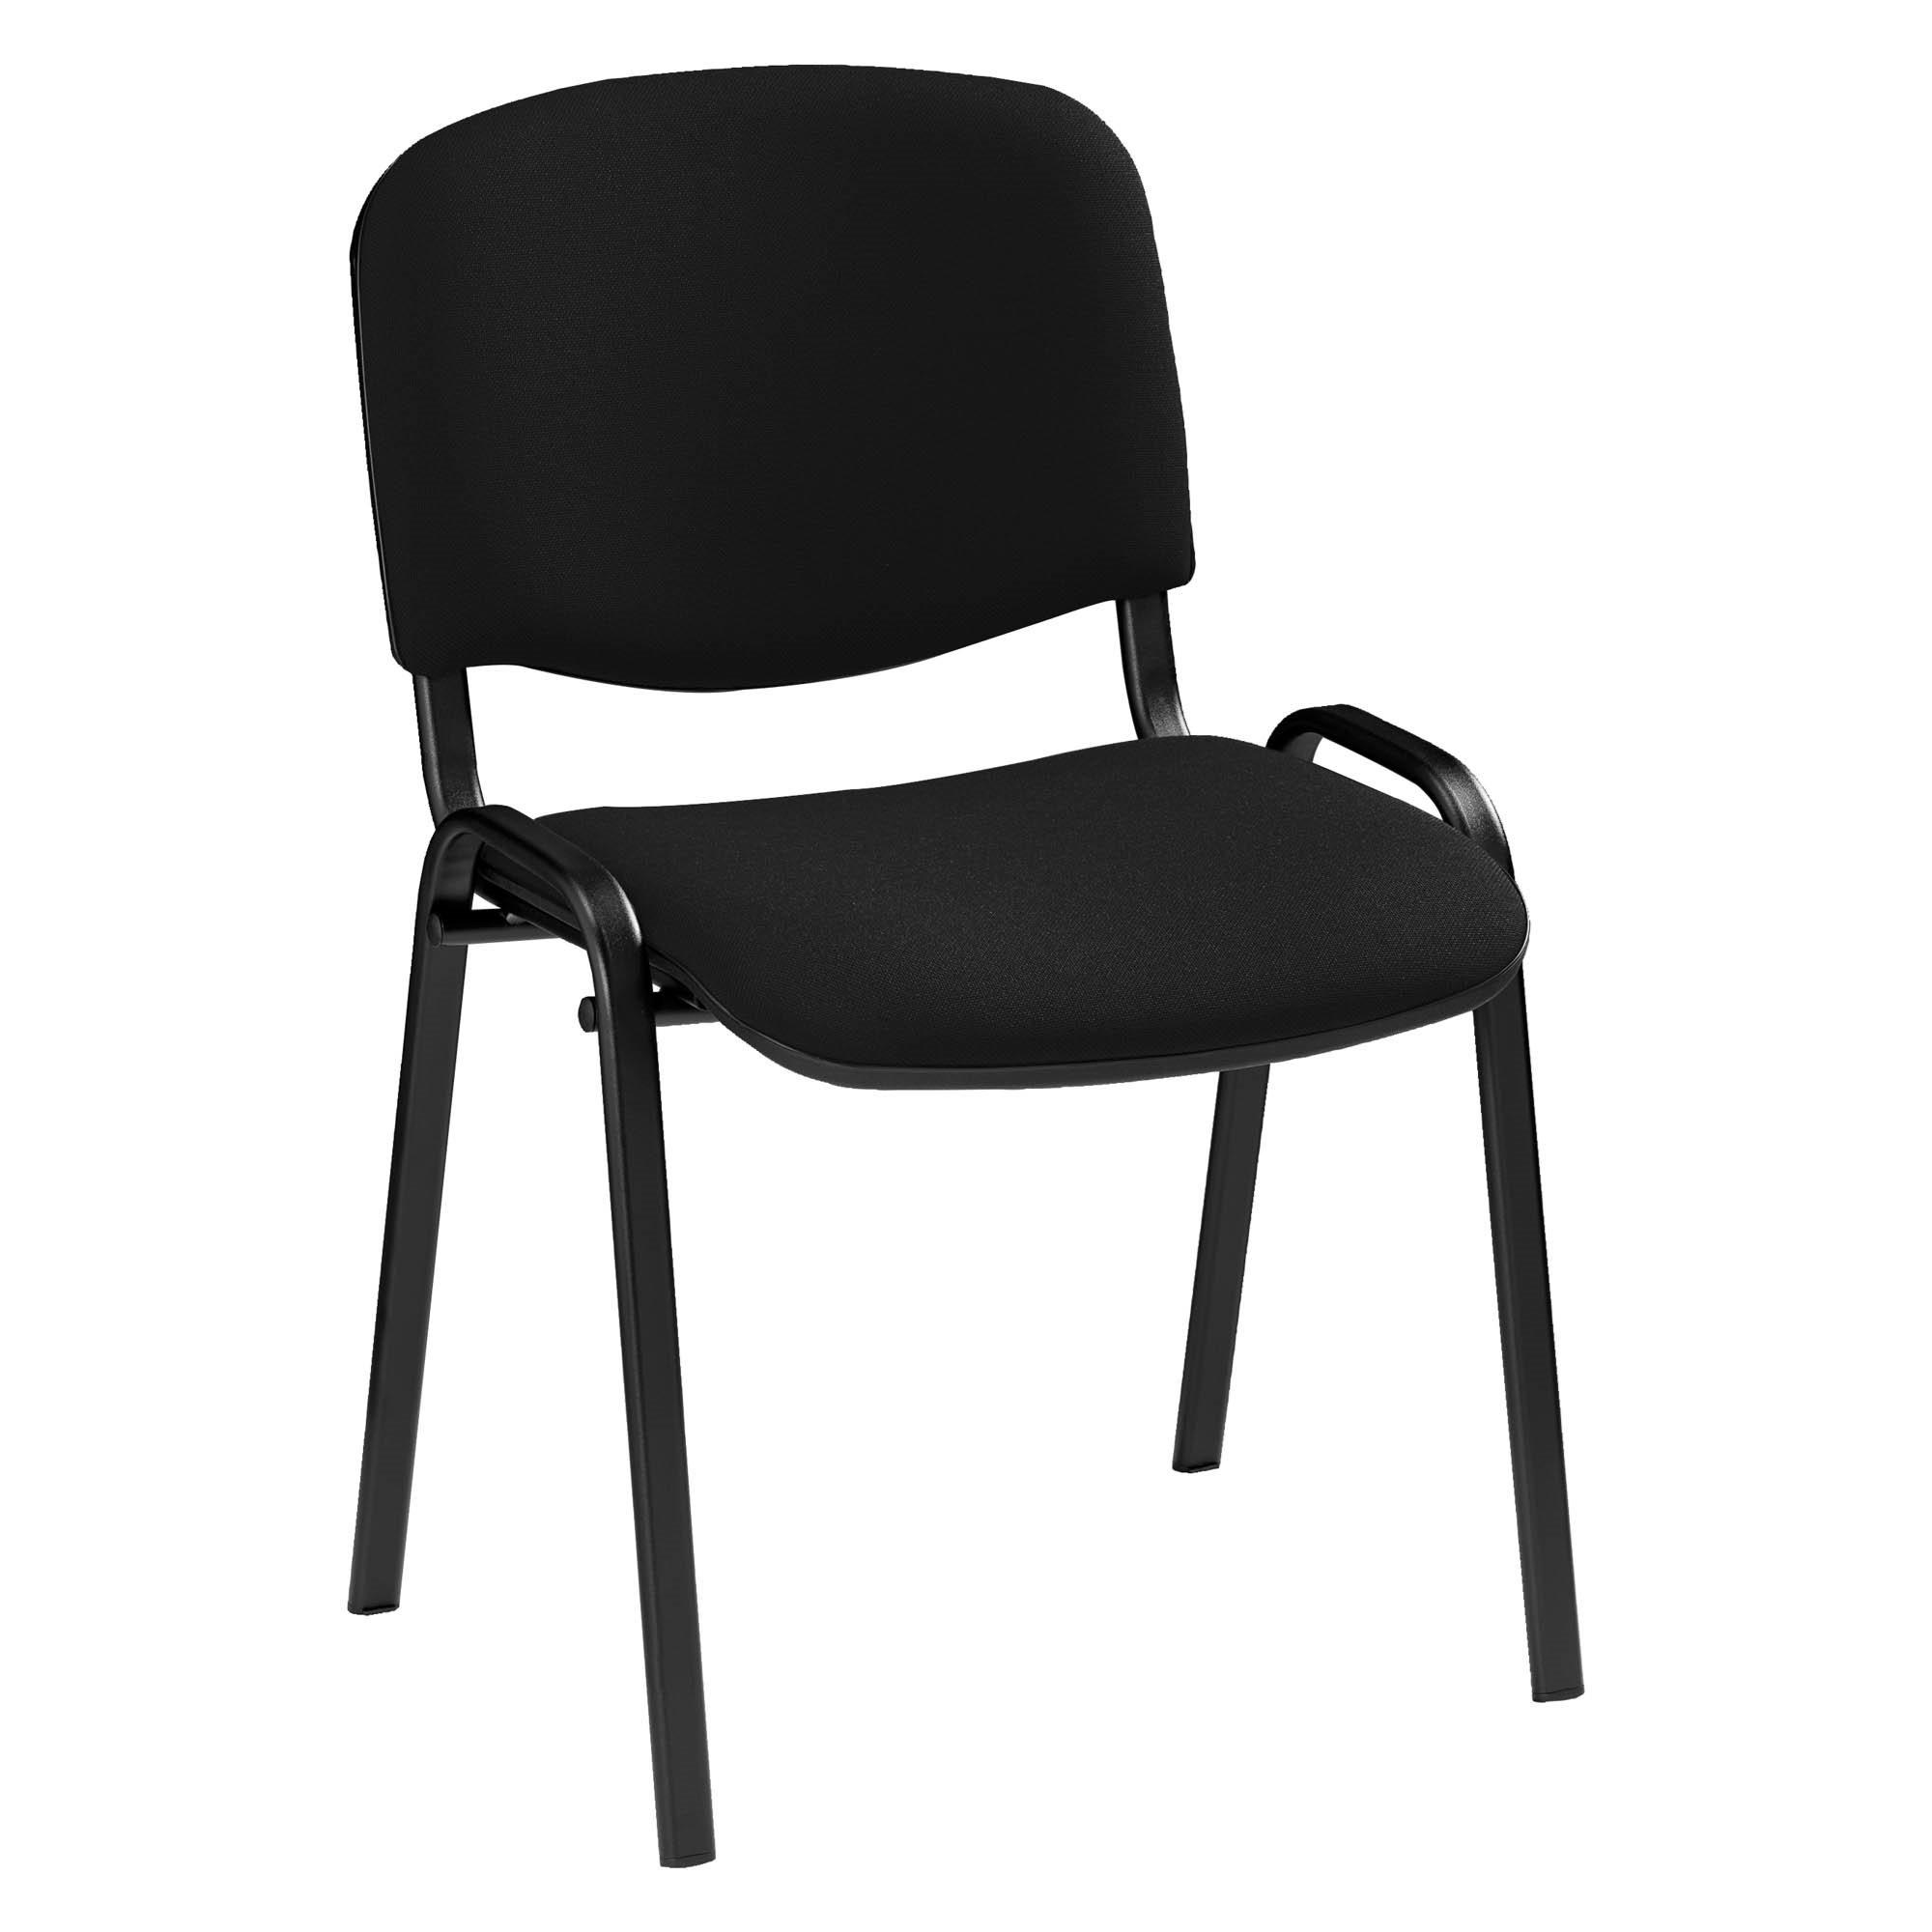 Chaise DOLLY - tissu noir